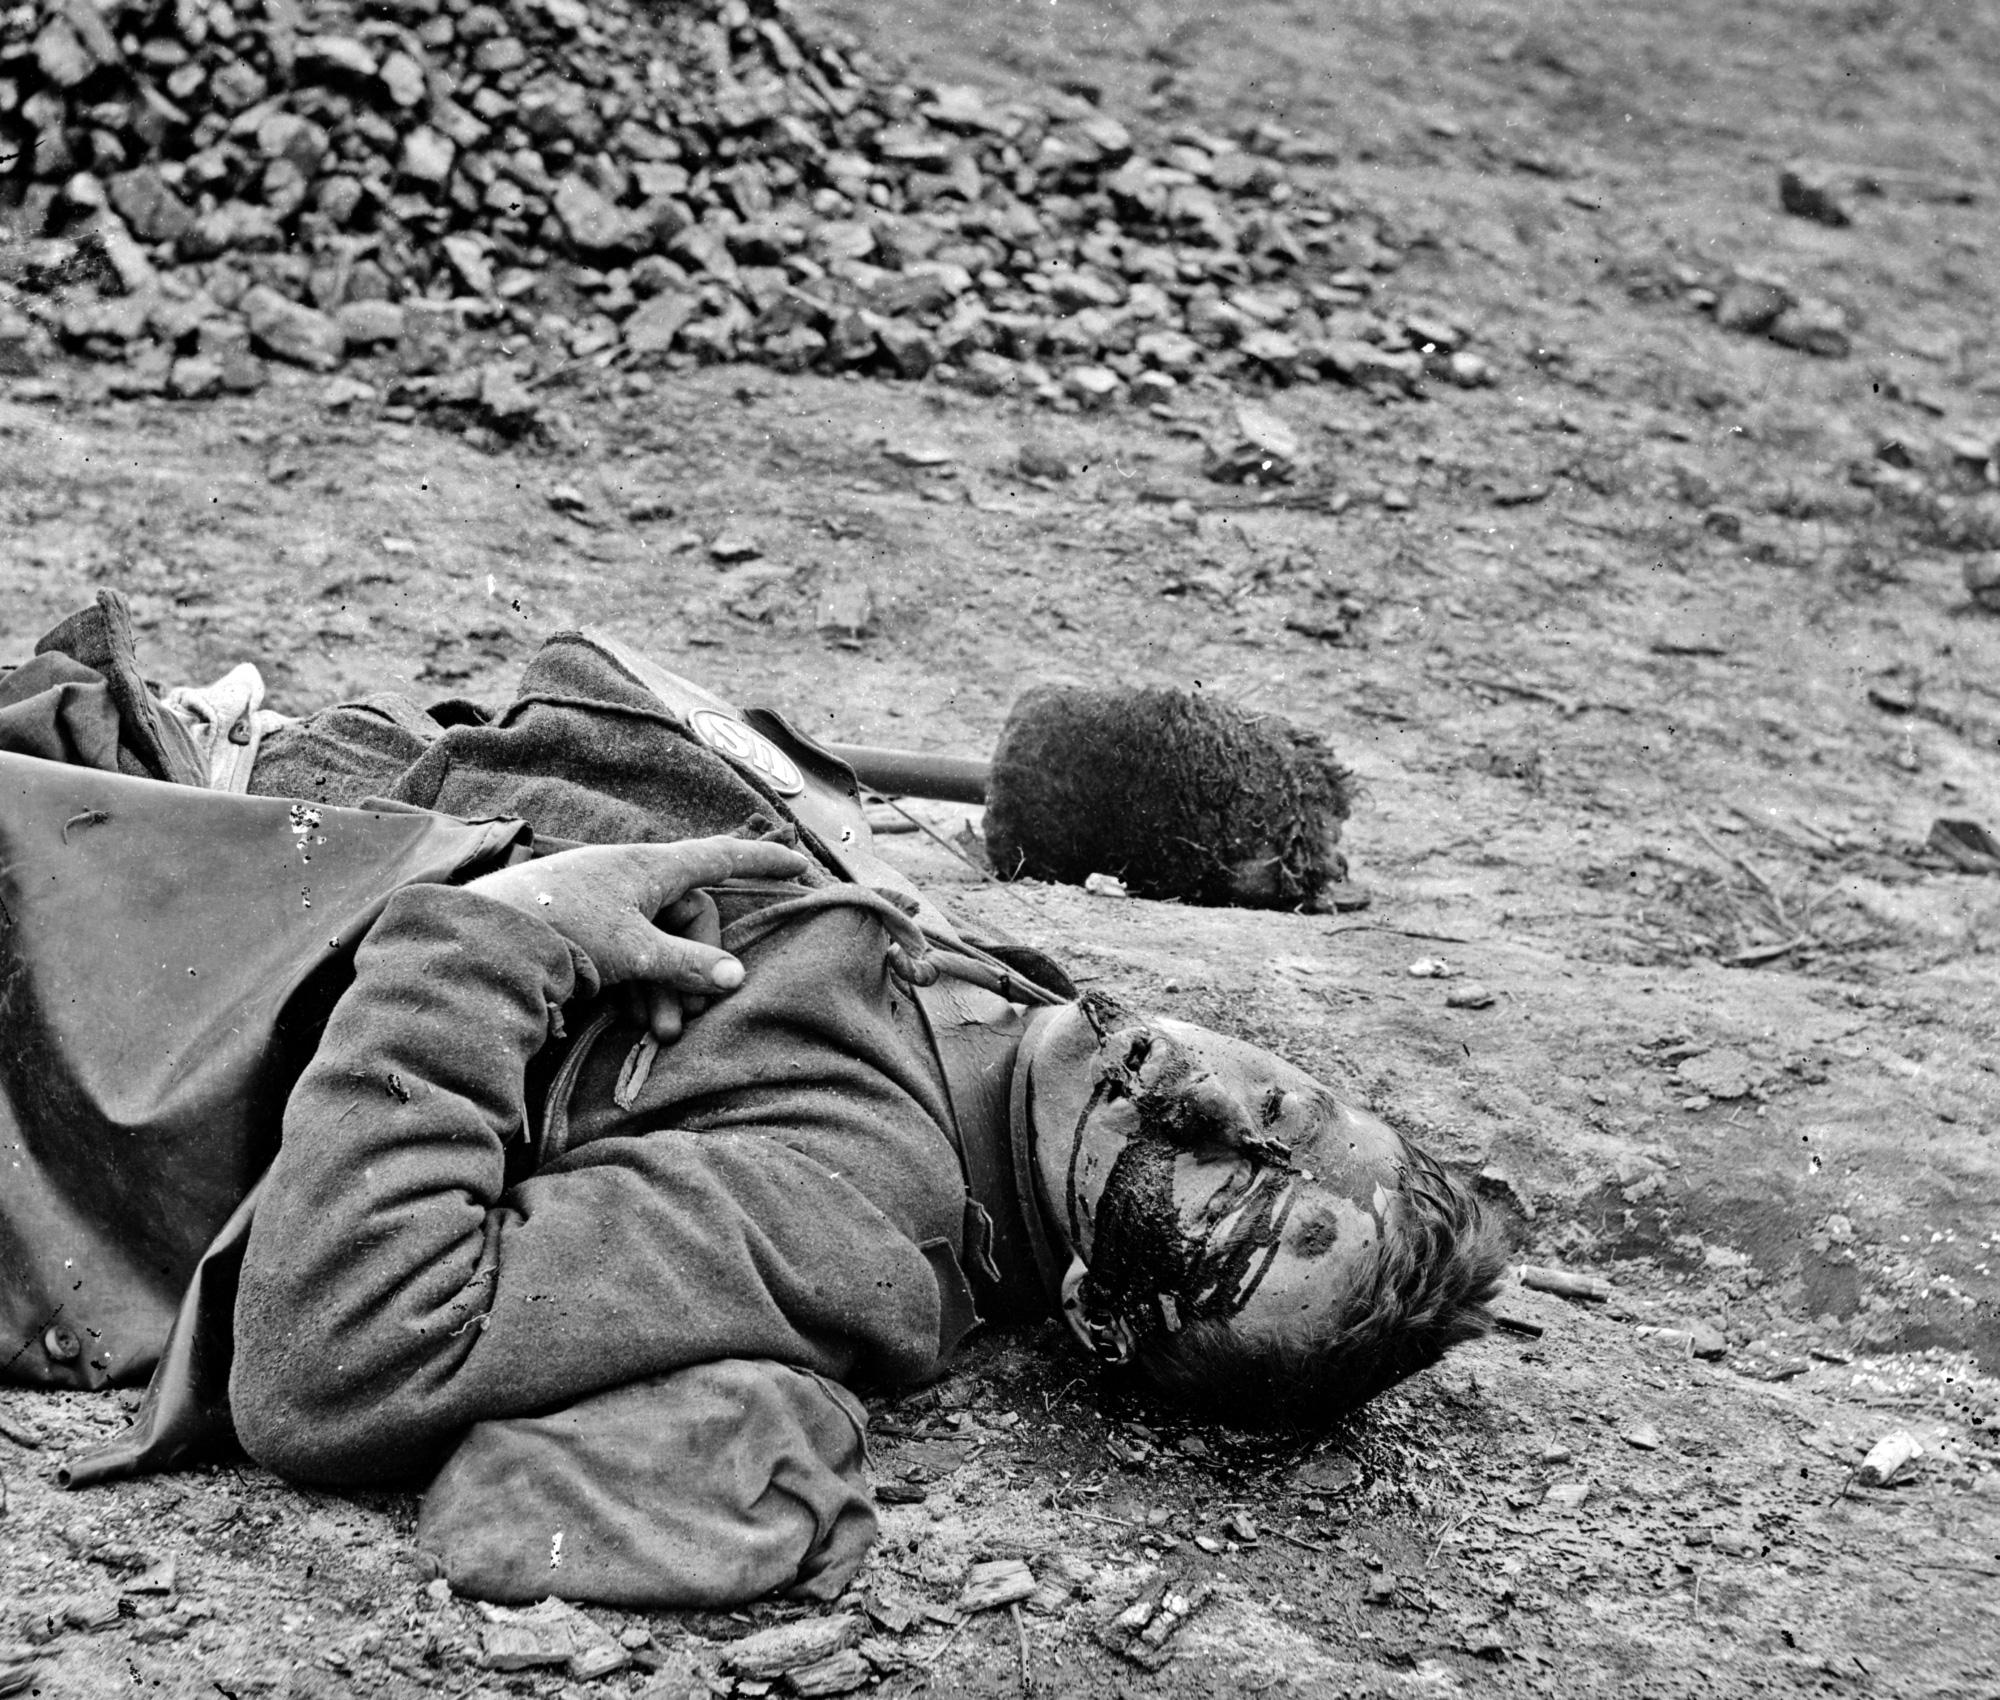 File:dead soldier (american civil war - siege of petersburg, april 1